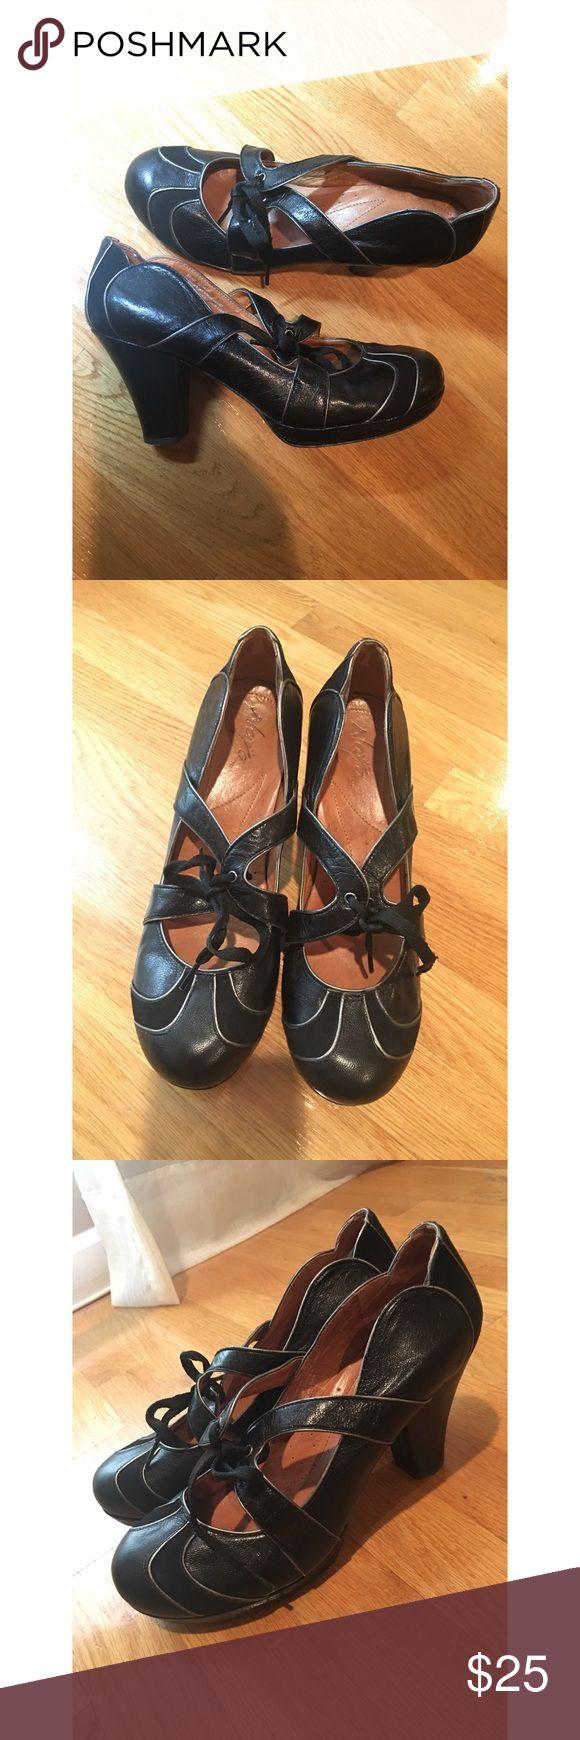 Anthropologie Naya Shoes Leather Anthropologie Brand heels 3 1/2 inches Naya Shoes Heels